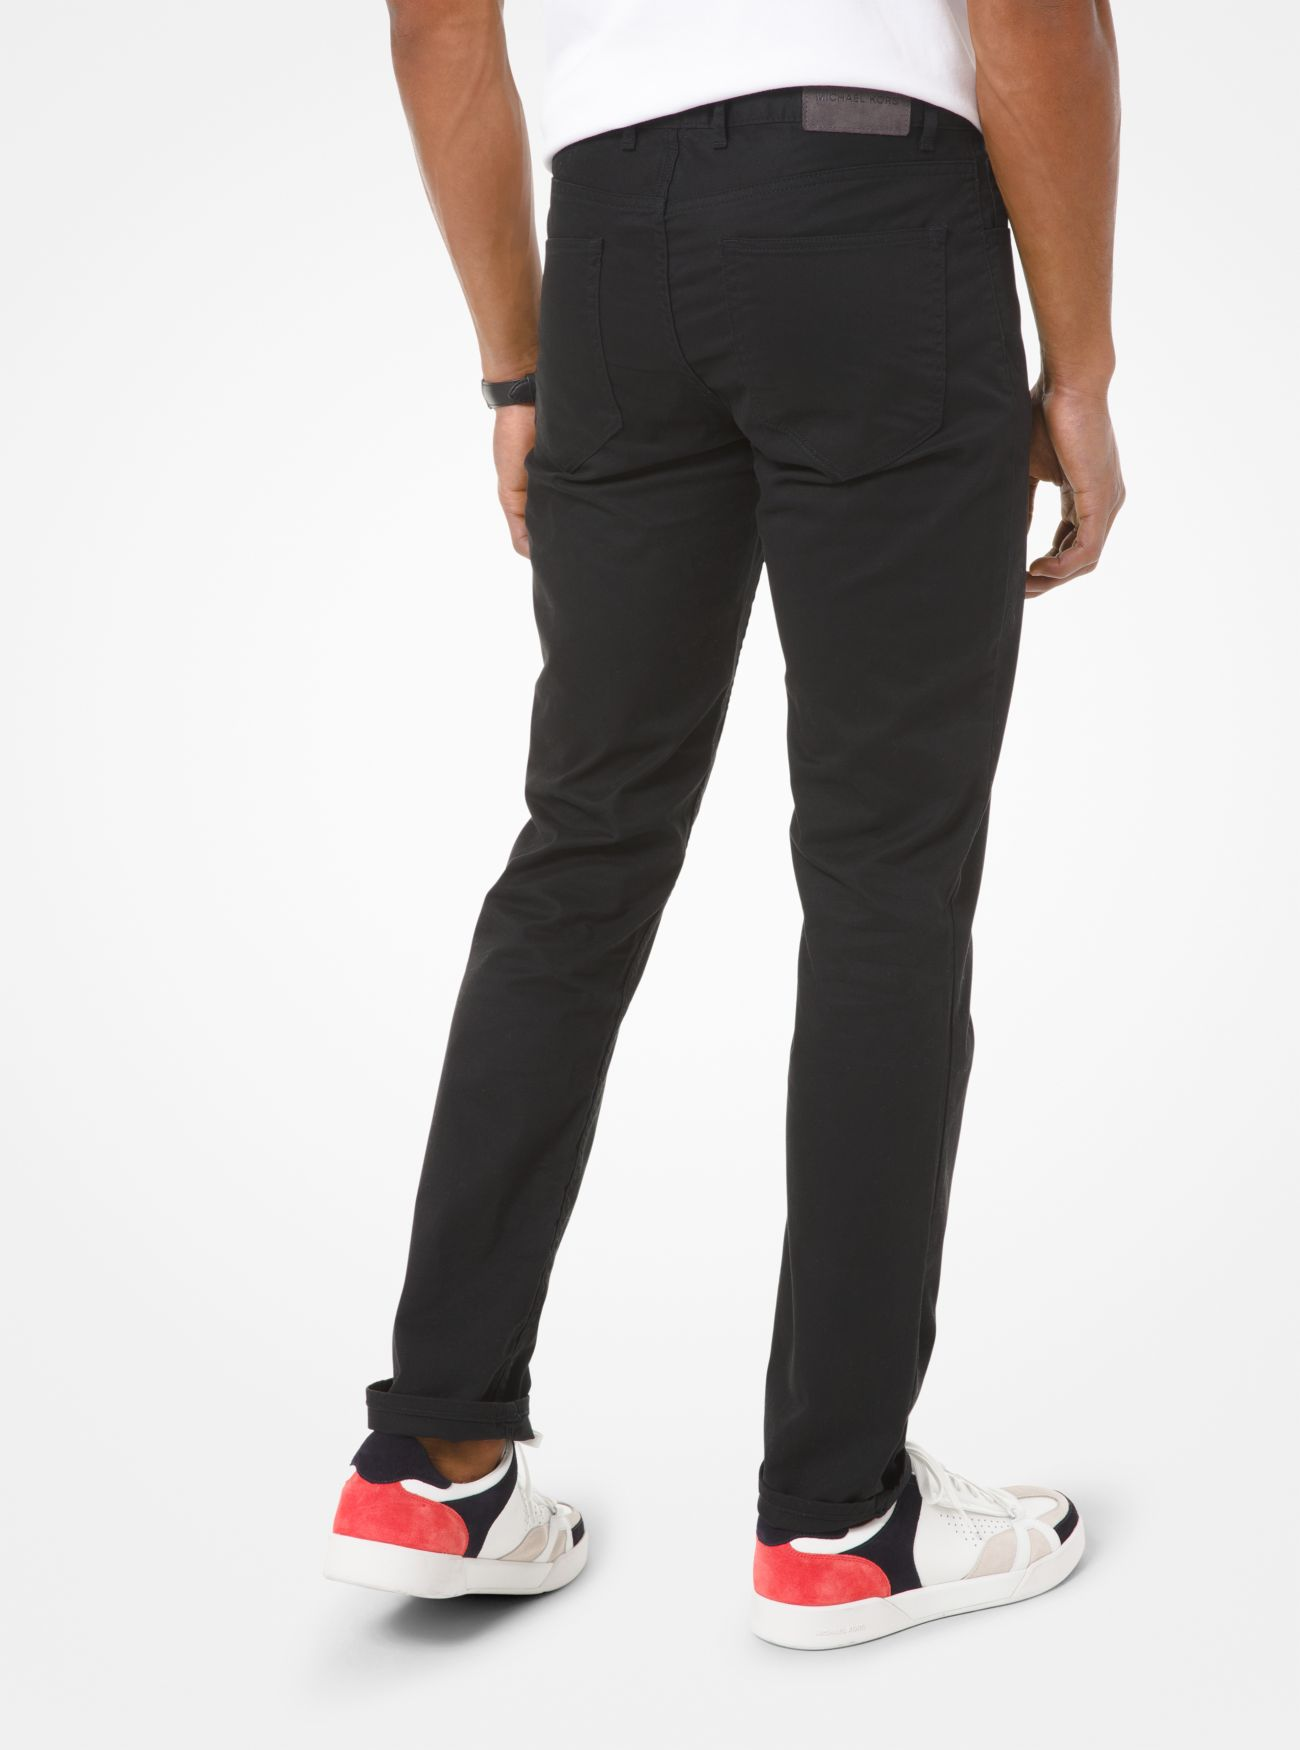 Узкие эластичные штаны Parker Michael Kors